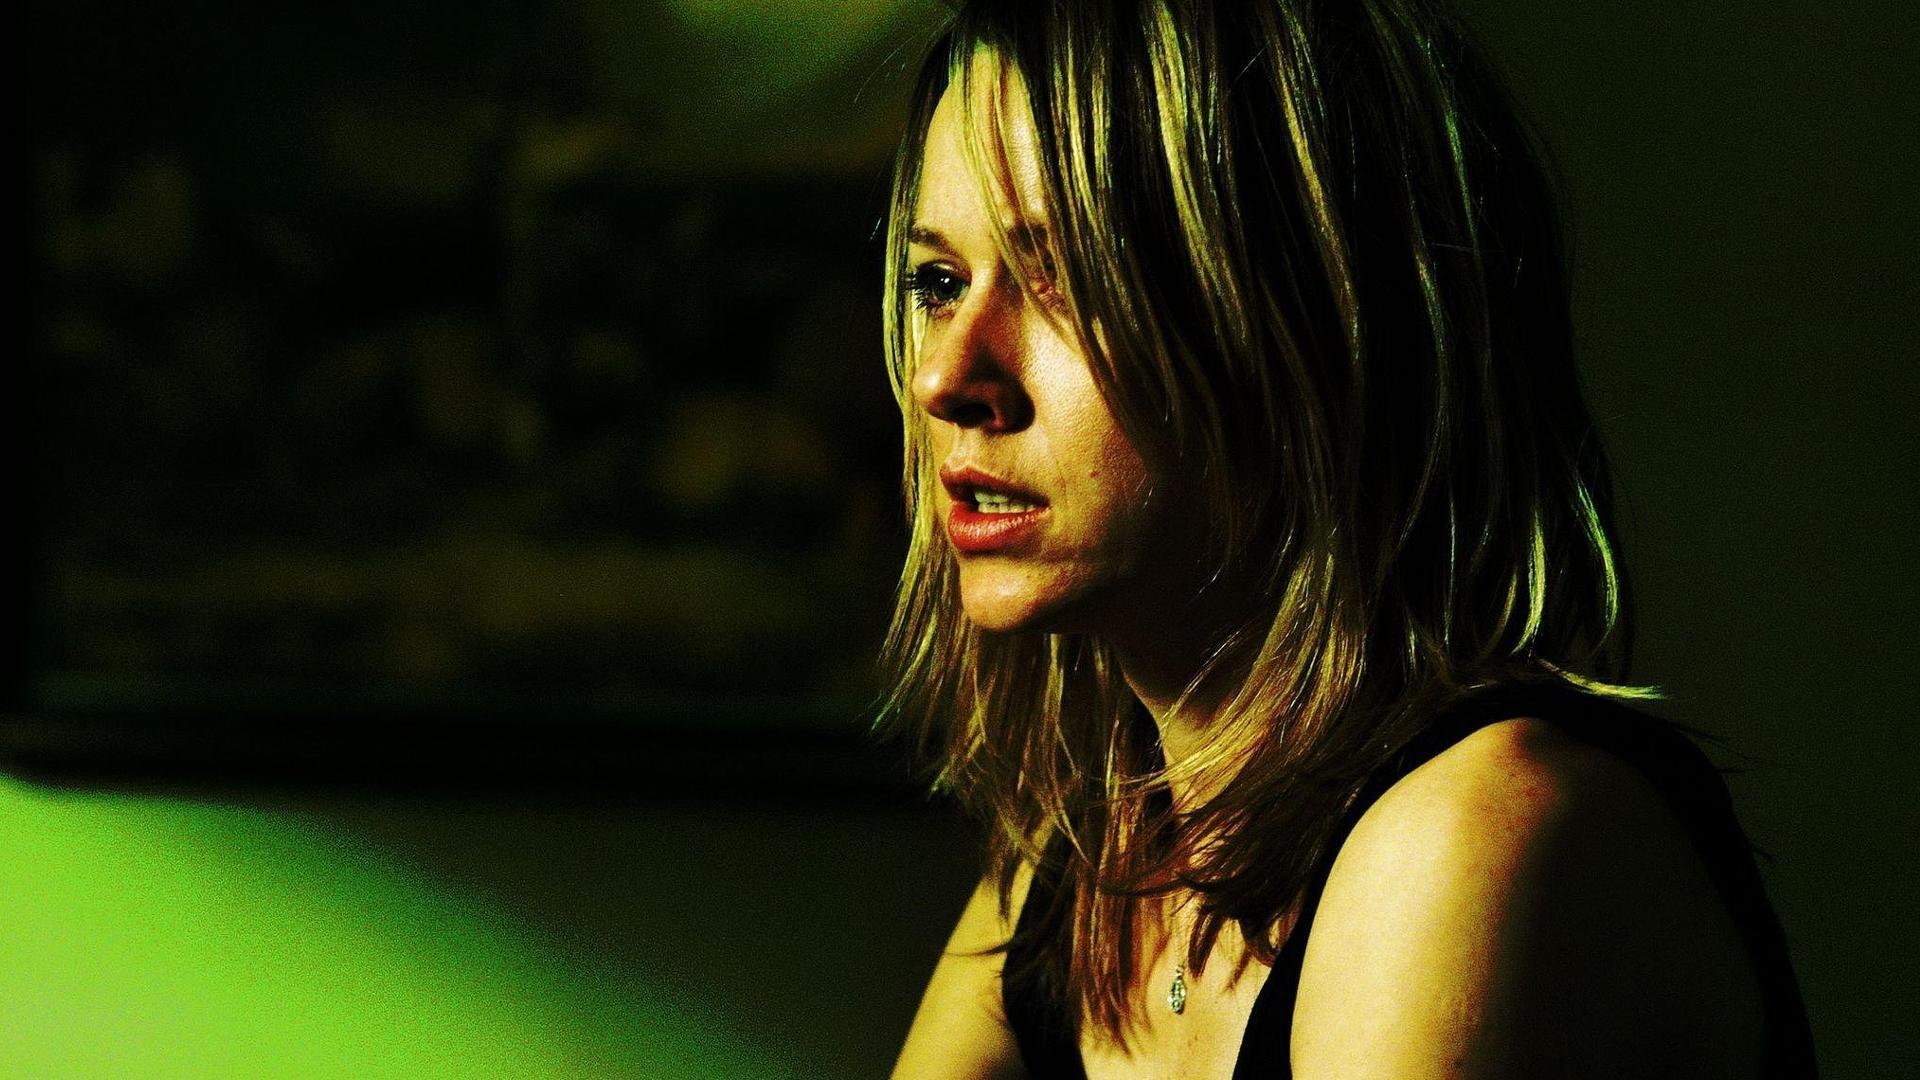 https://www.filmnod.com/media/picture/2/21-grams-2003.jpg